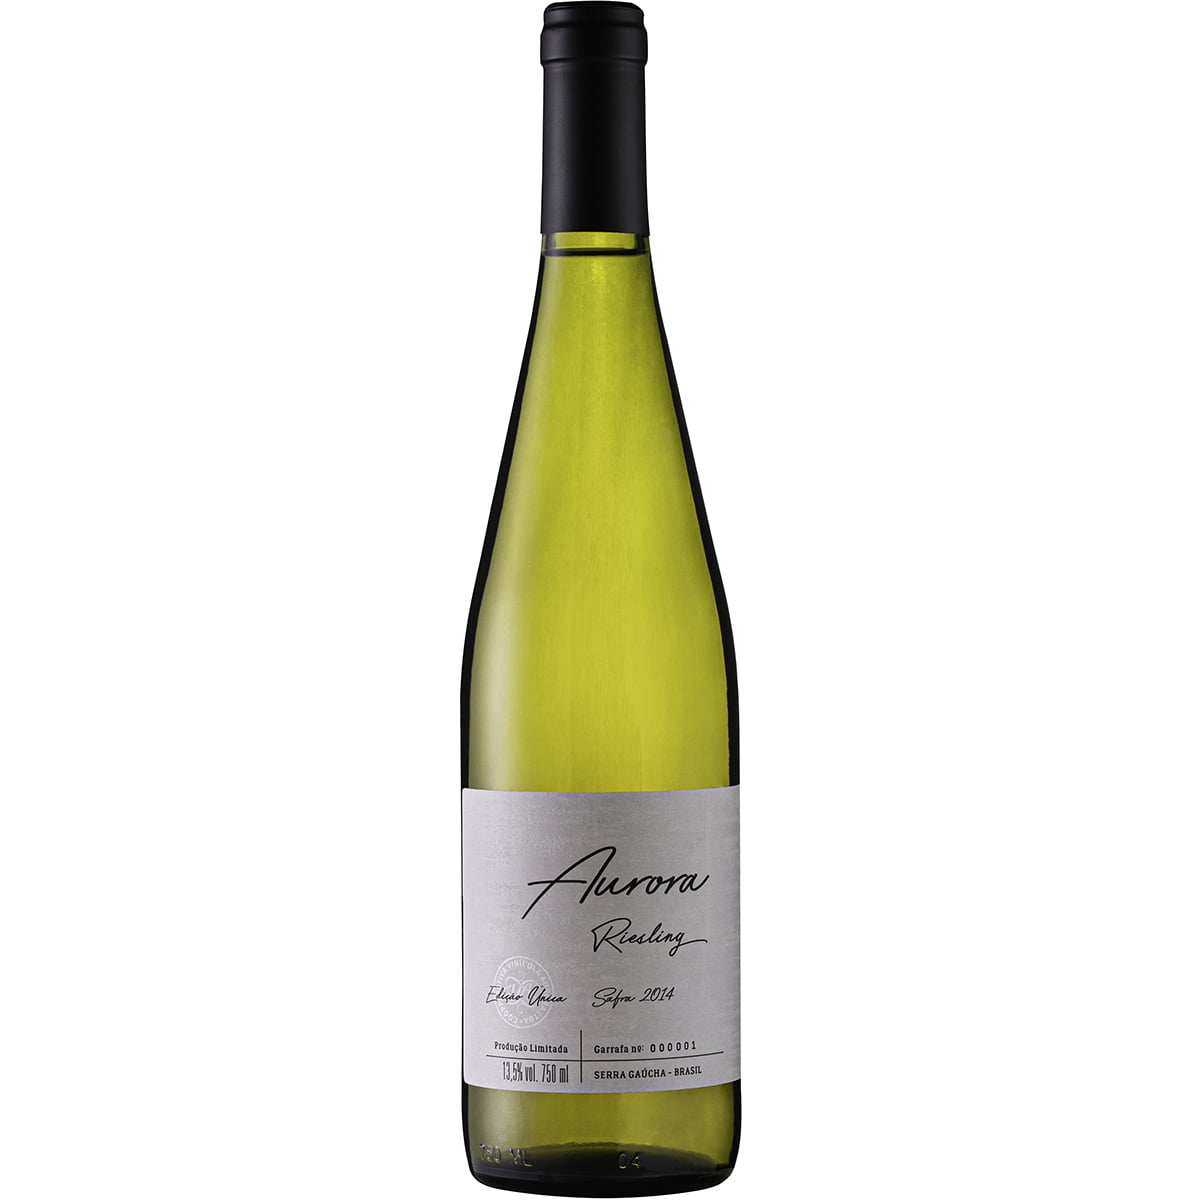 Vinho Aurora Riesling Edição Única Safra 2014 Branco Seco 750ml